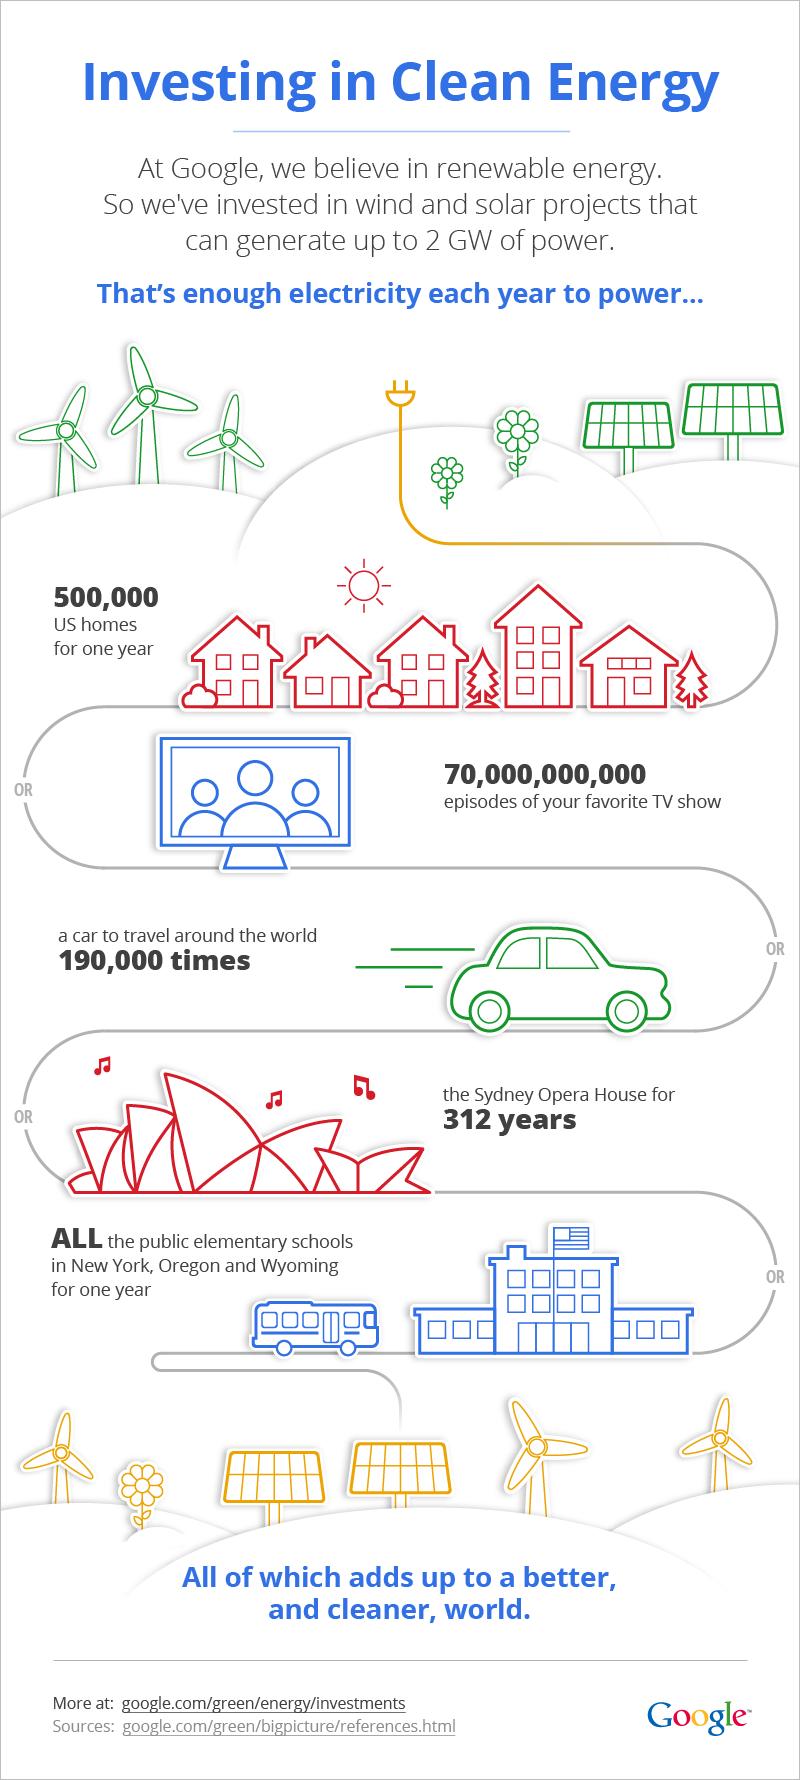 google-2gw-renewable-energy-investment-graphic